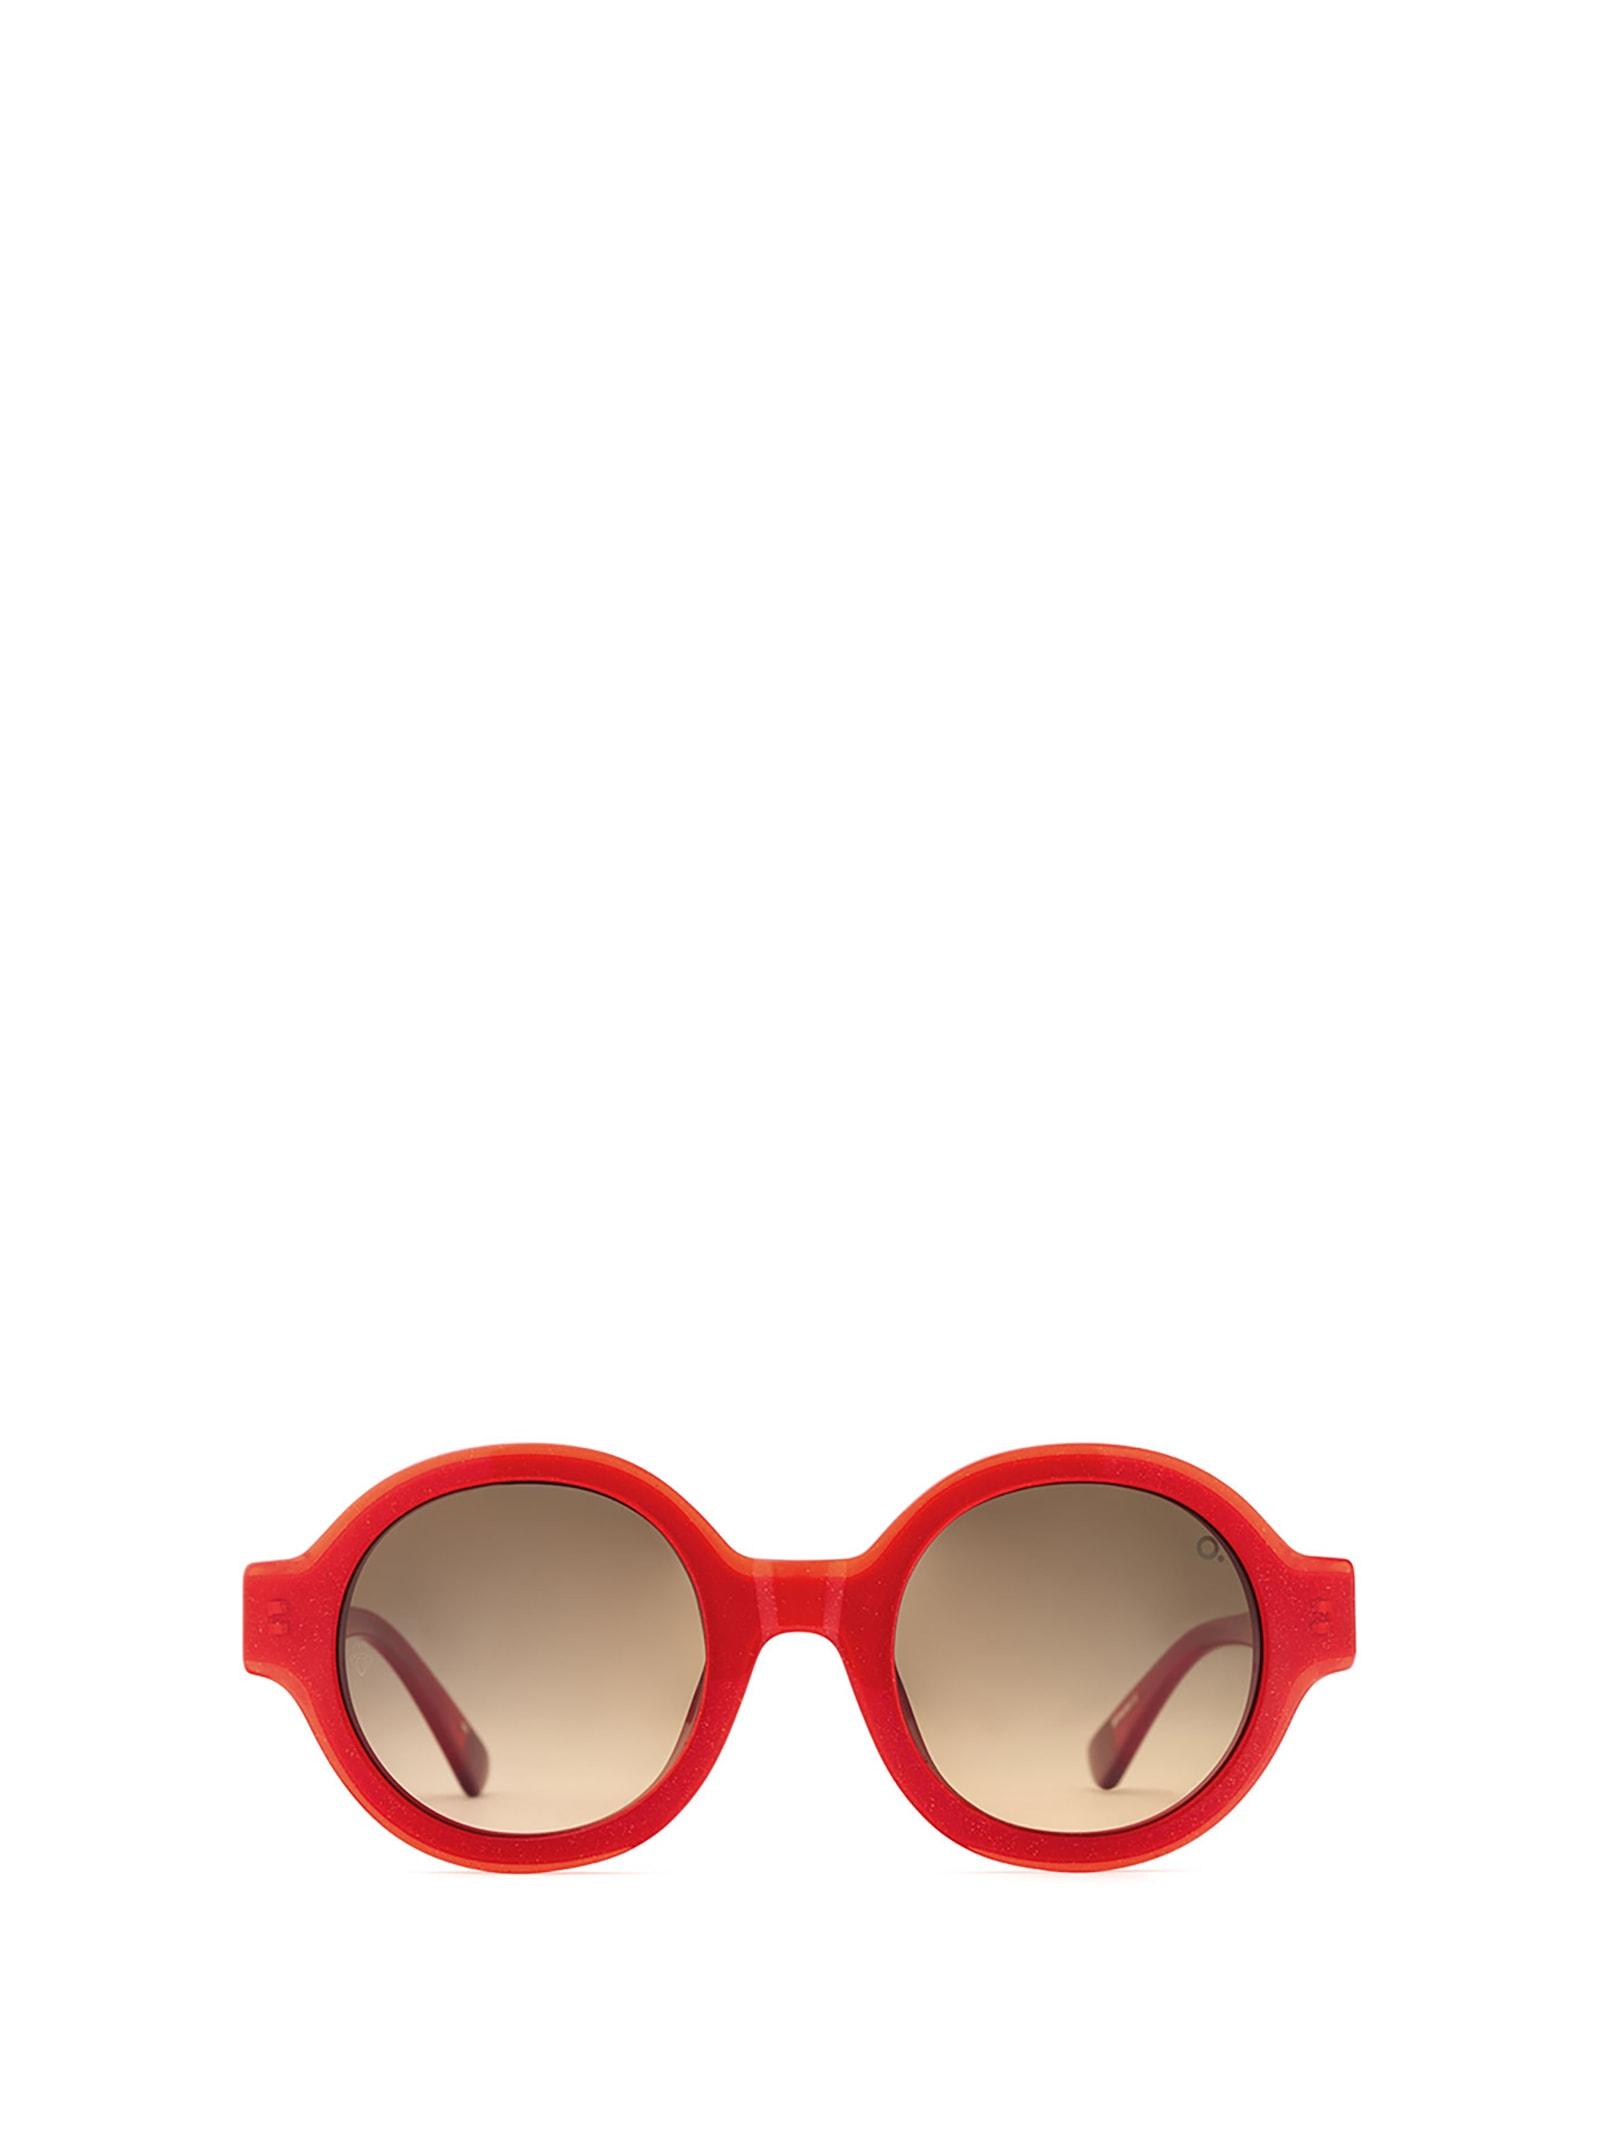 Etnia Barcelona Etnia Barcelona Etna Rd Sunglasses